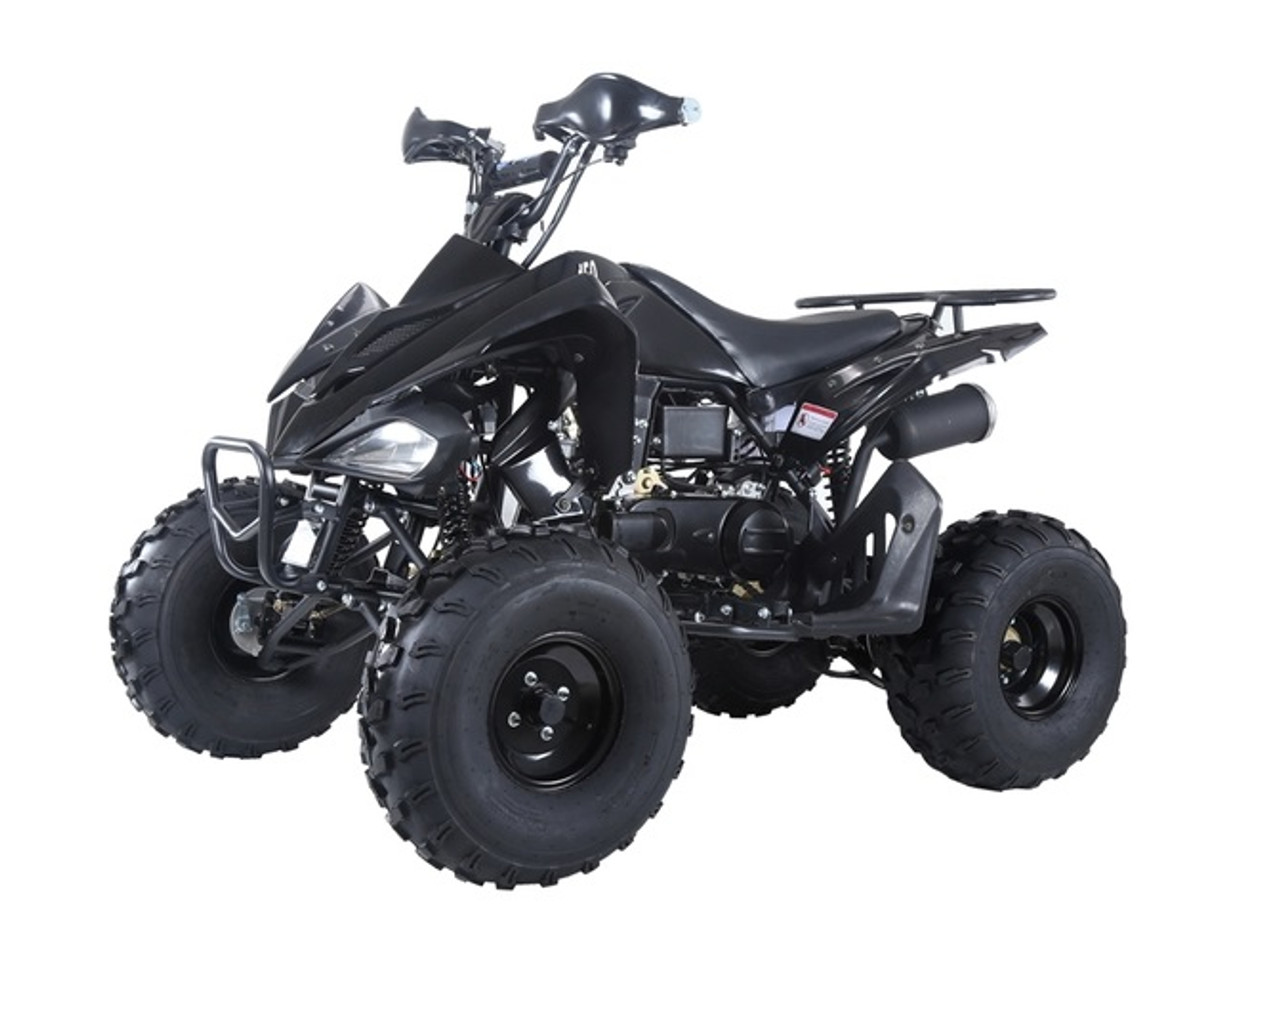 Taotao Motor 150G, 150CC, Air Cooled, 4-Stroke, 1-Cylinder, Automatic ATV